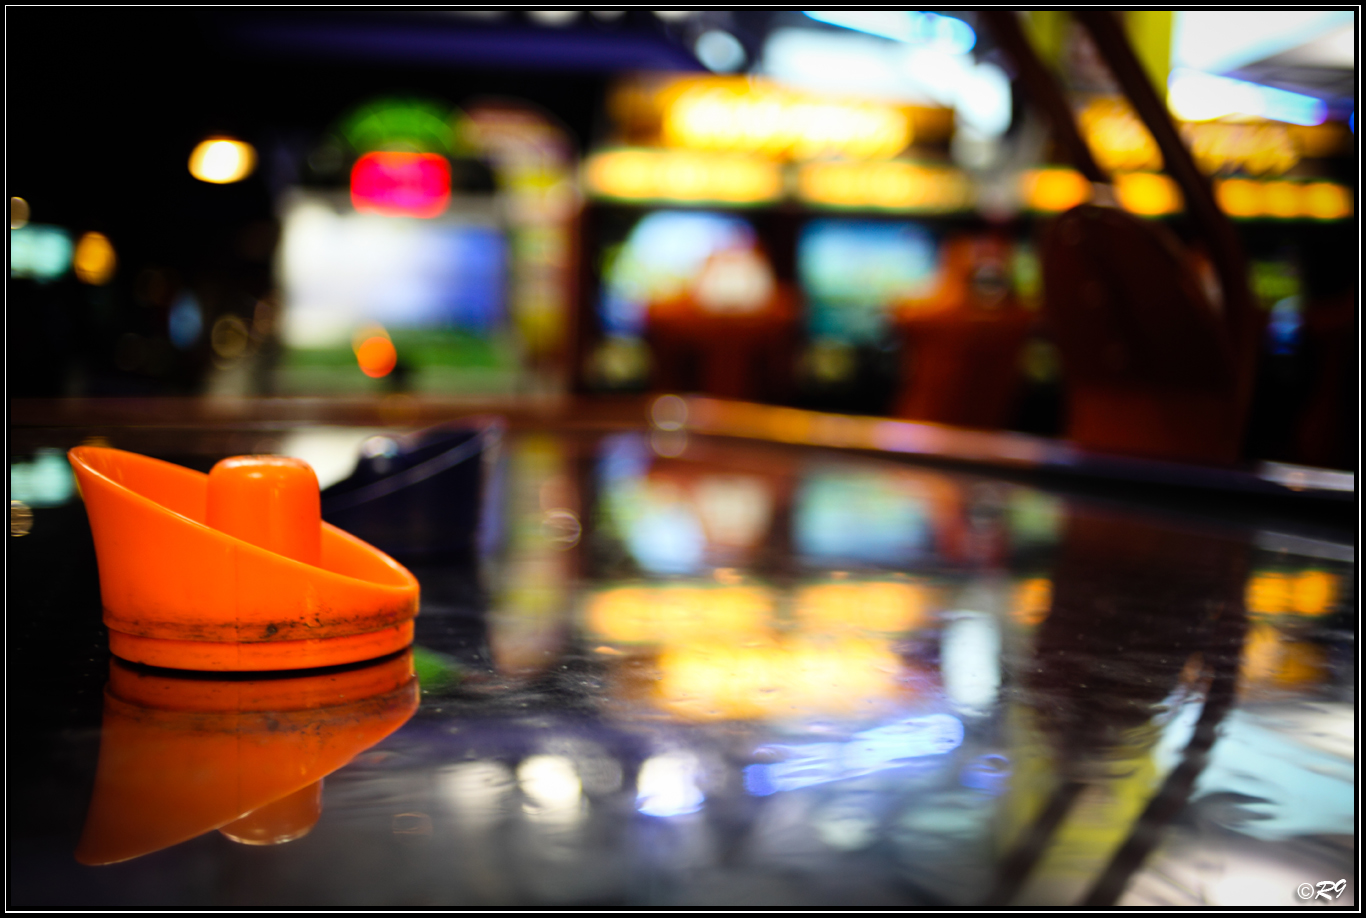 официальный сайт казино адмирал зеркало на айфон